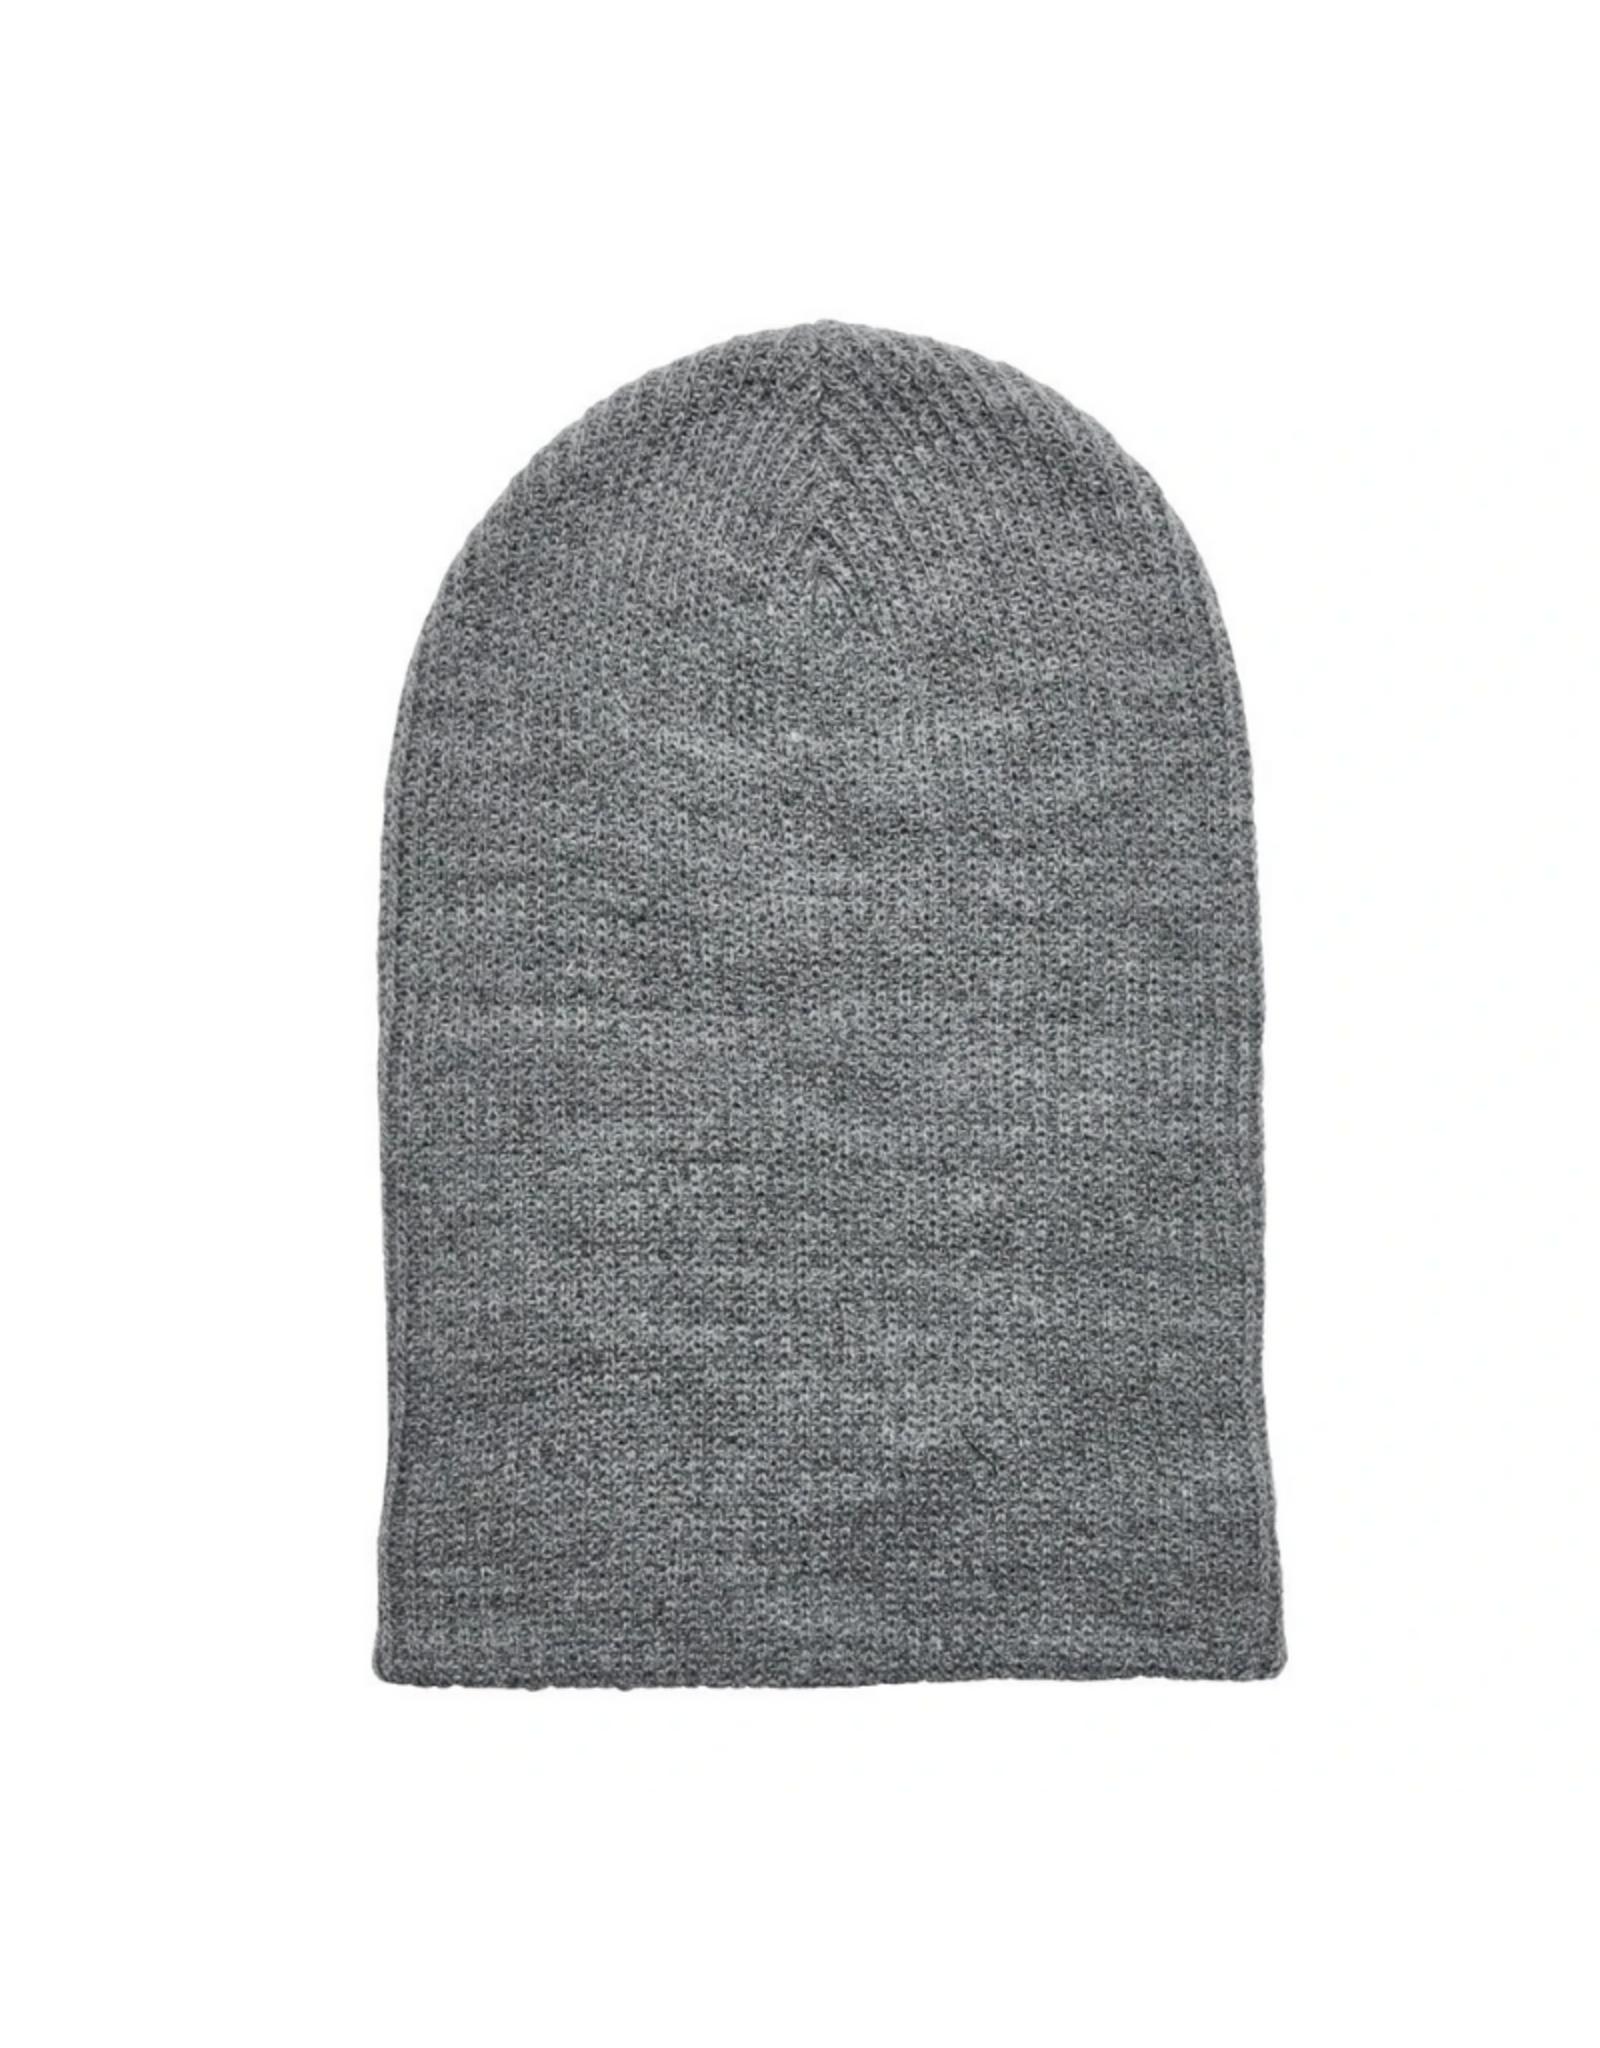 HAT-KNIT BEANIE-SLOUCHY